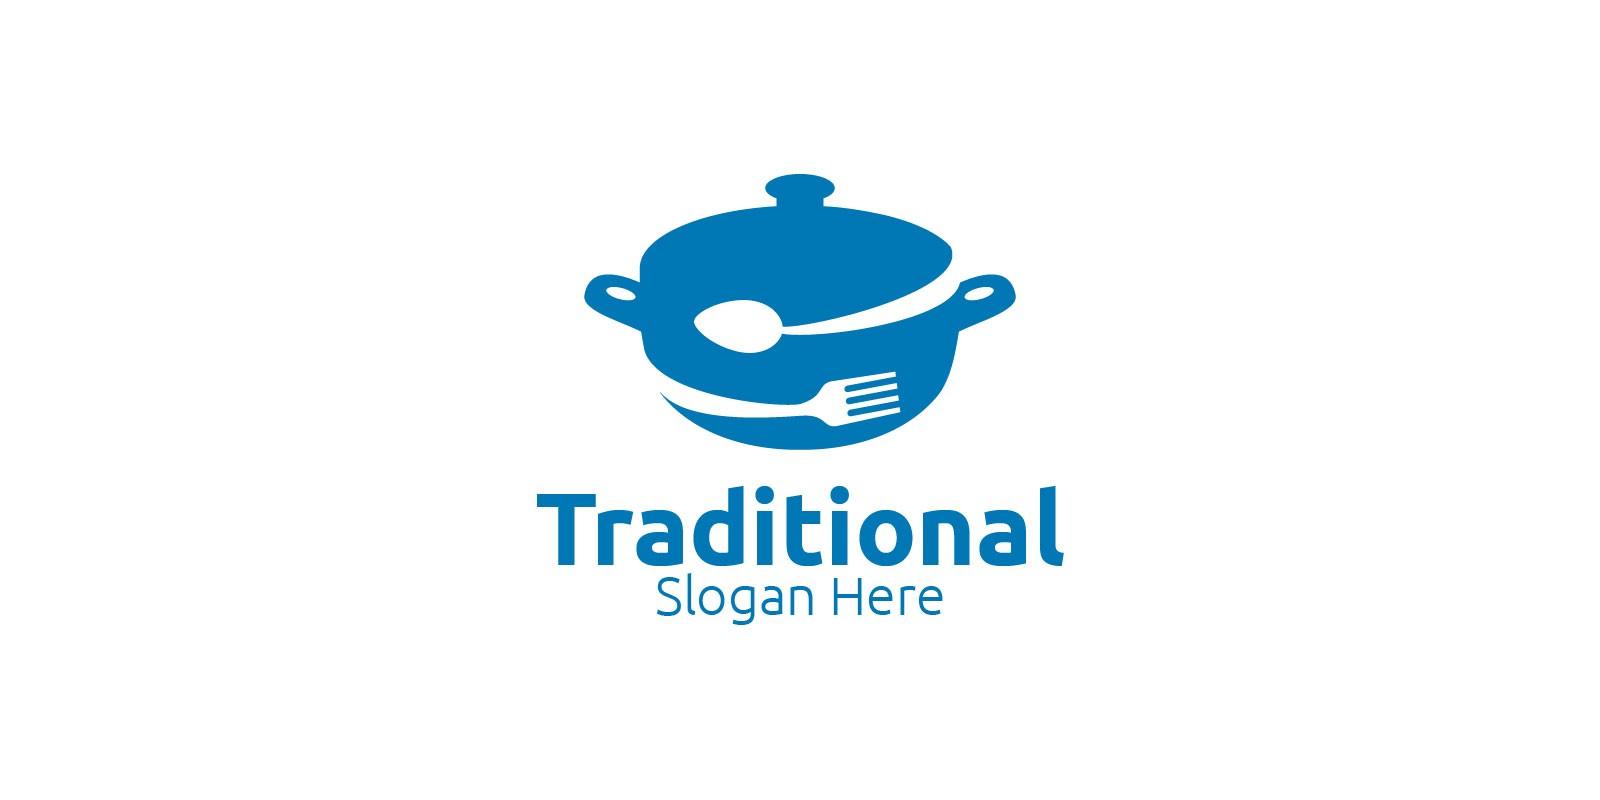 Traditional Food Logo For Restaurant Or Cafe By Denayunecs Codester